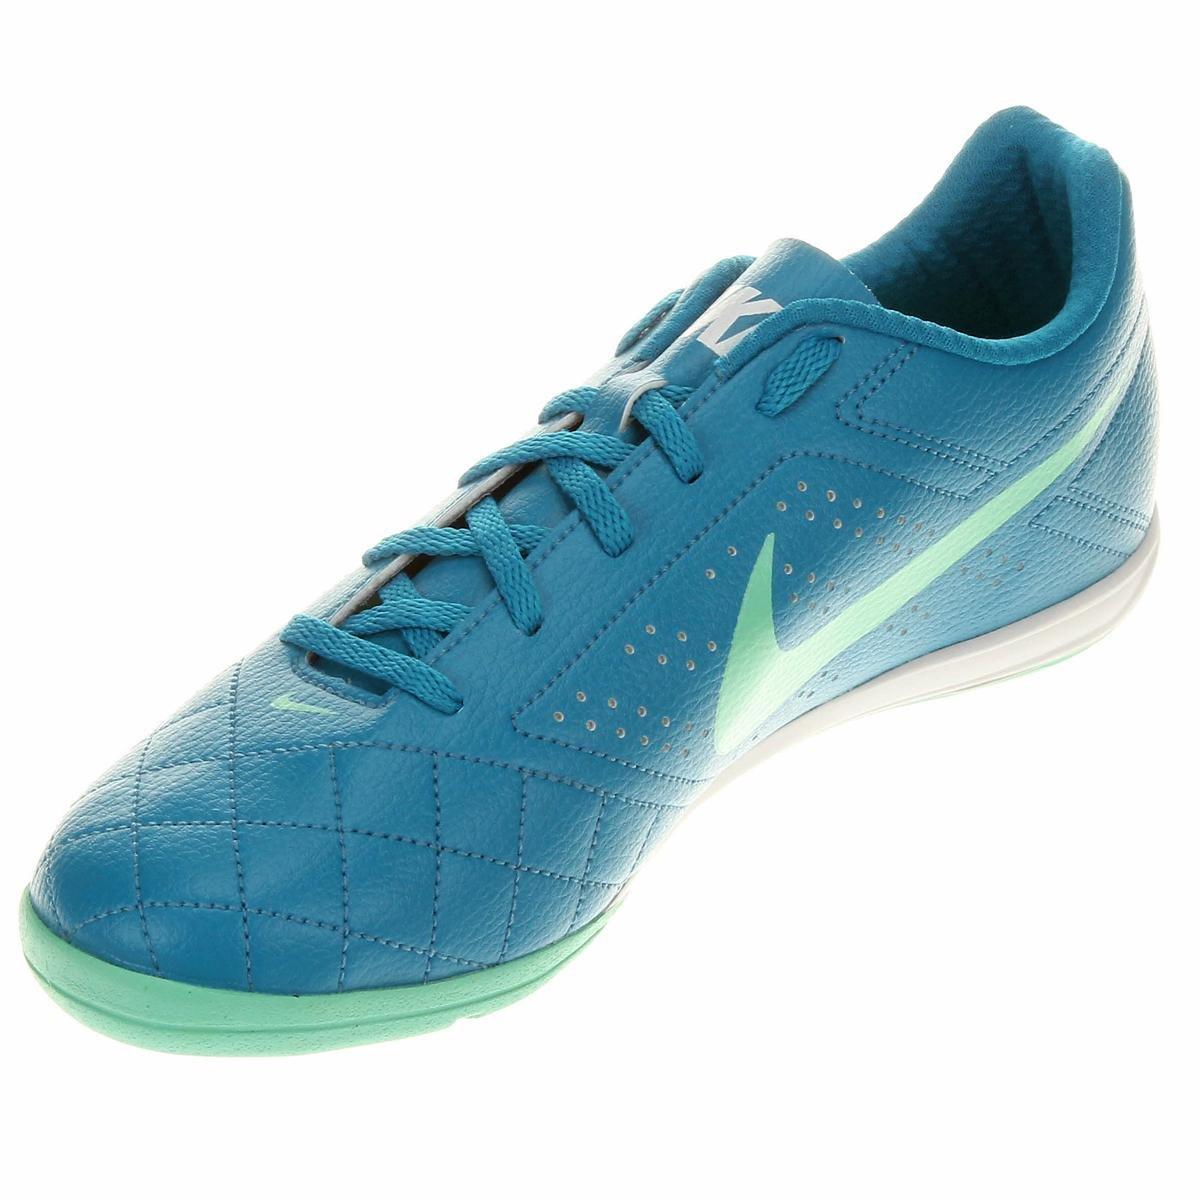 Verde Chuteira Beco Futsal Nike e Água Futsal Masculina 2 Azul wZ8Cvxw